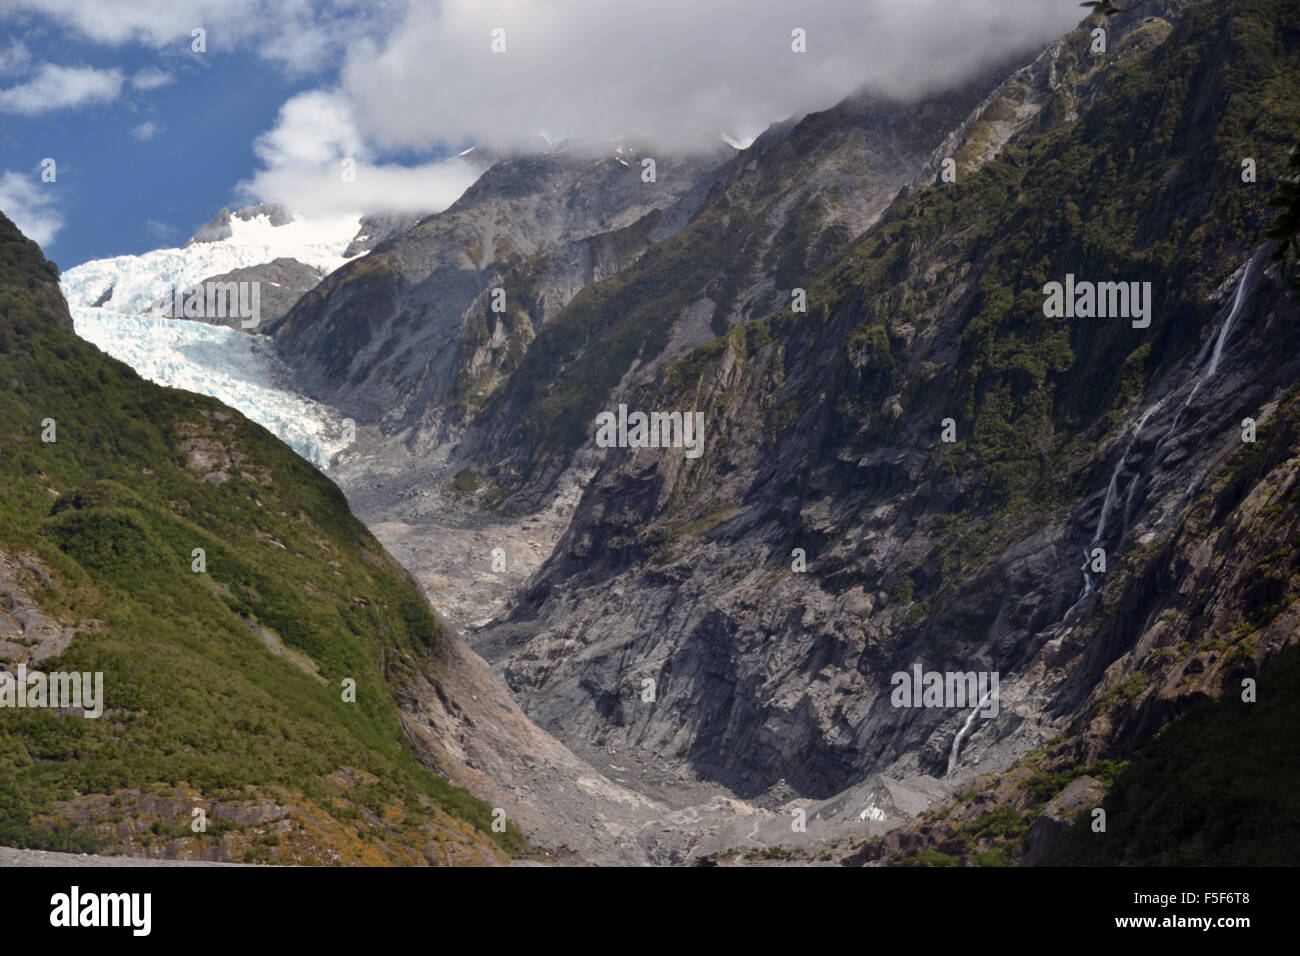 Franz Josef Glacier, a glacier melting due to climate change, Franz Josef, South Island, New Zealand - Stock Image